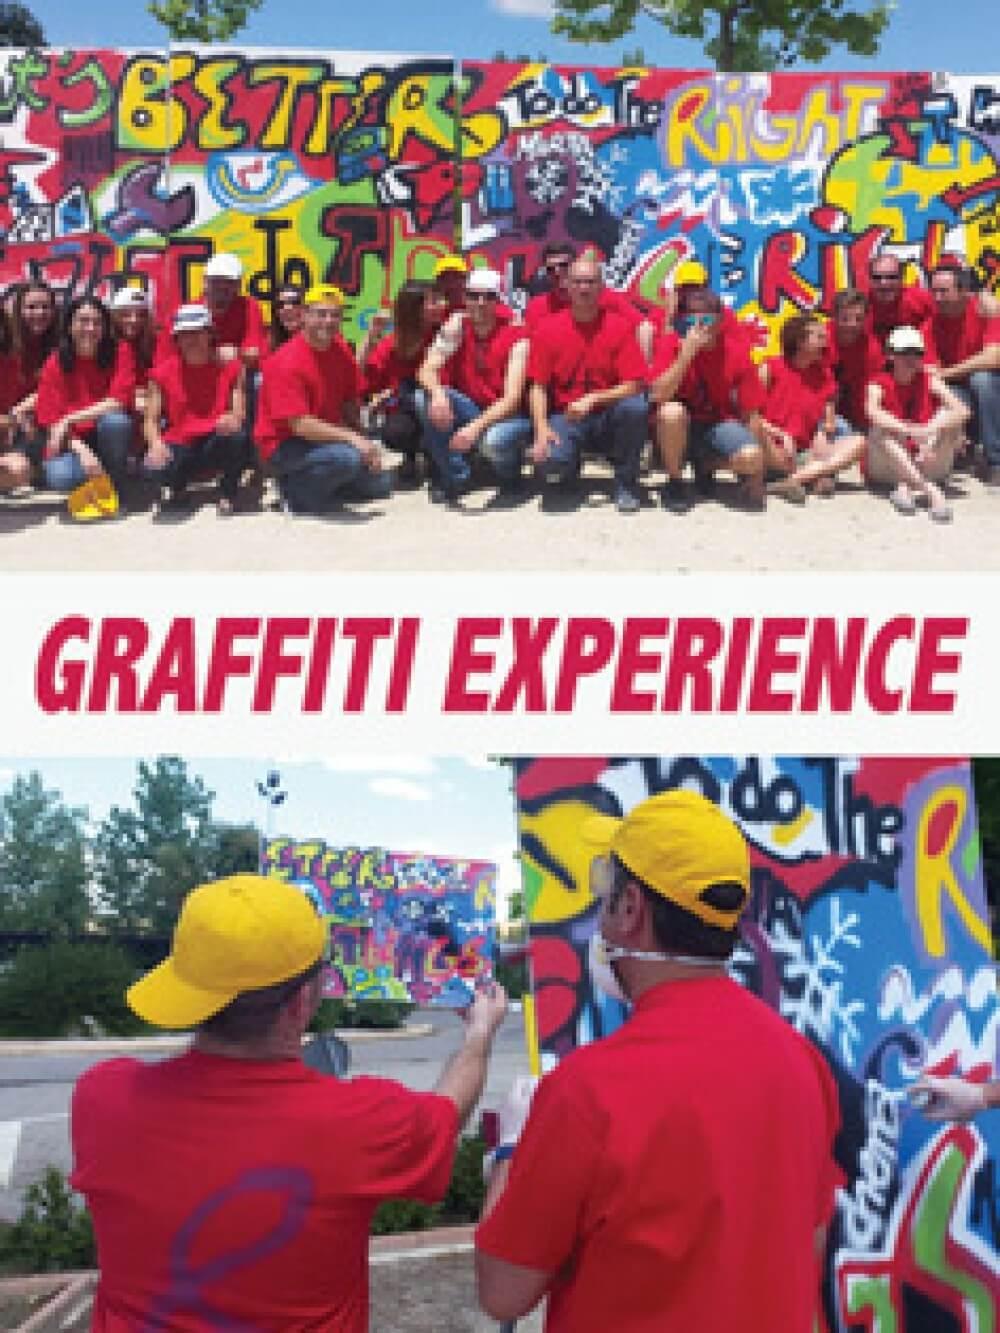 graffiti_experience_vertical_web